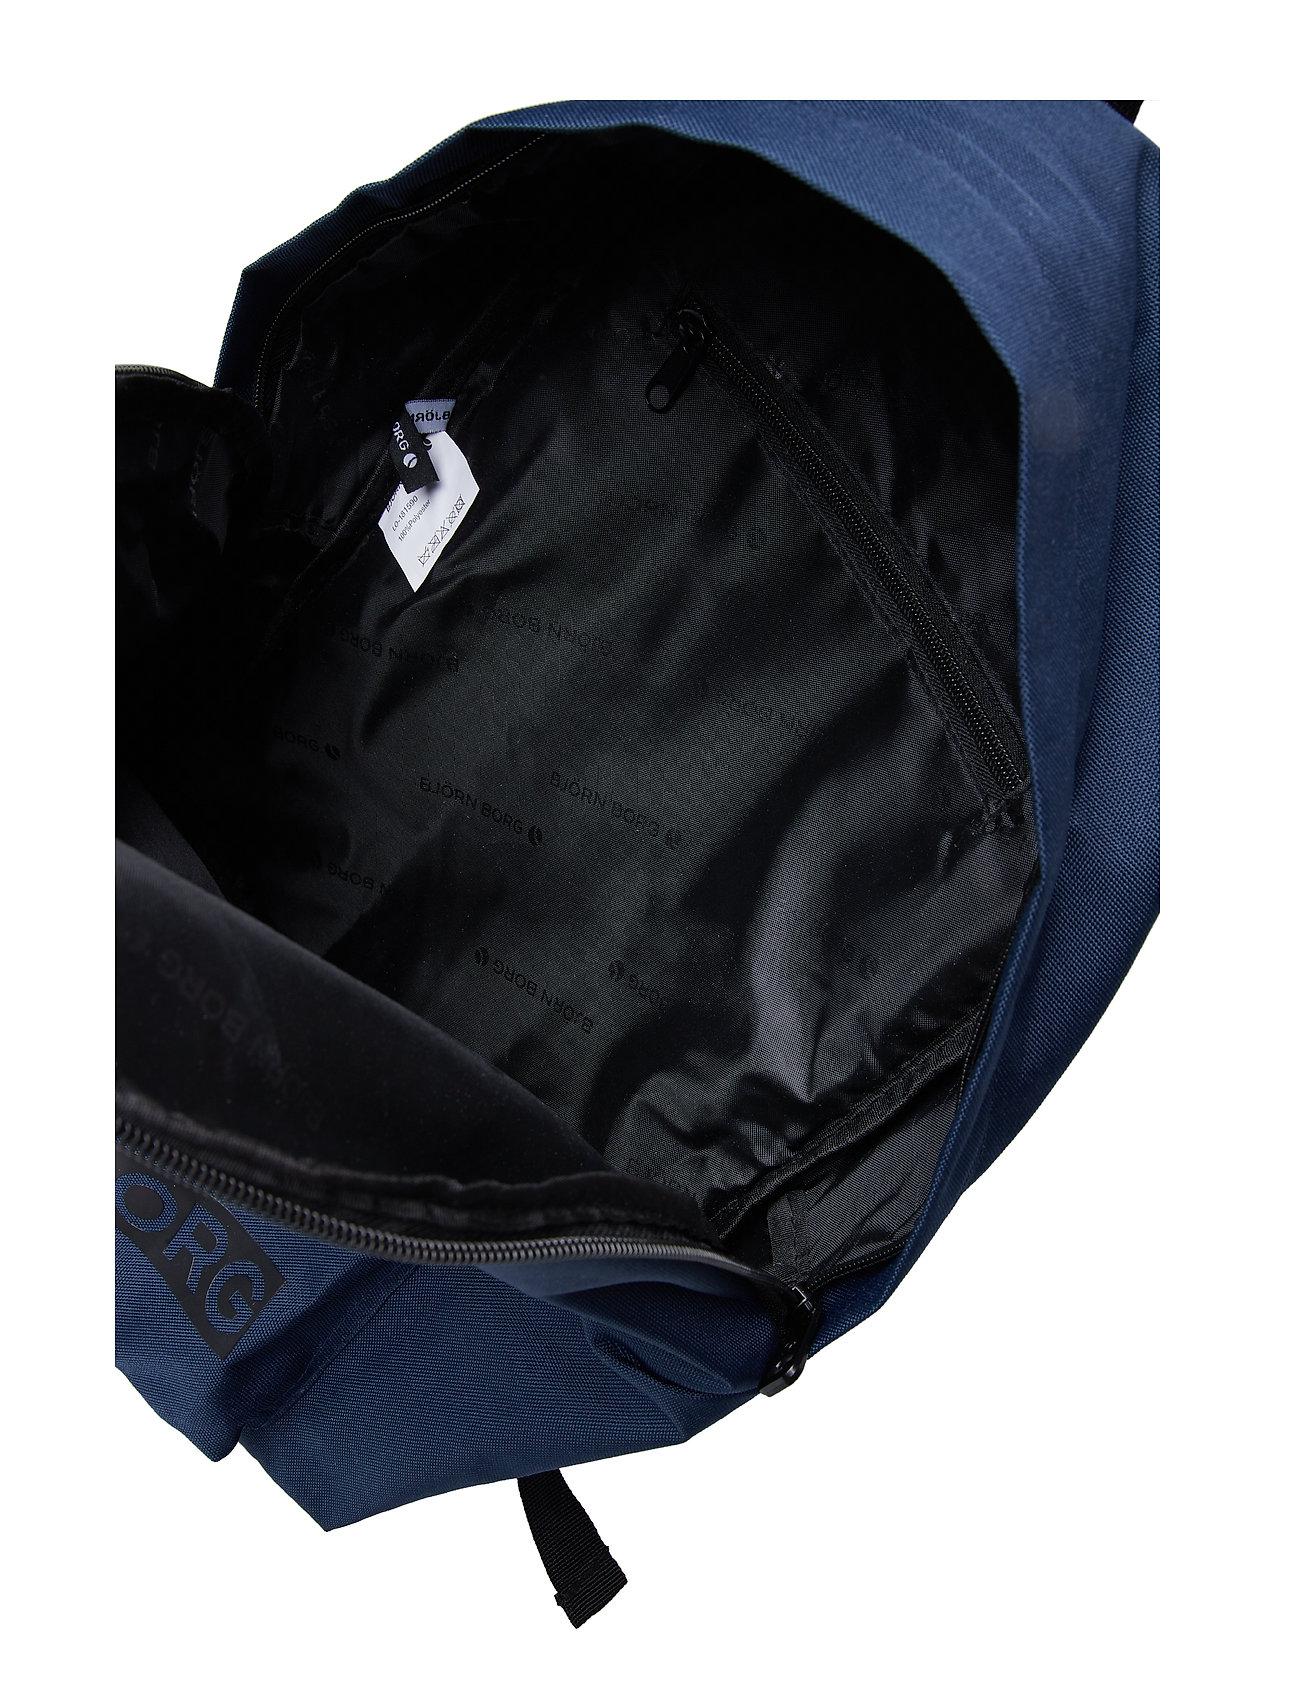 Bags Bags VictornavyBjörn Borg VictornavyBjörn Borg VictornavyBjörn MGpqSVUz